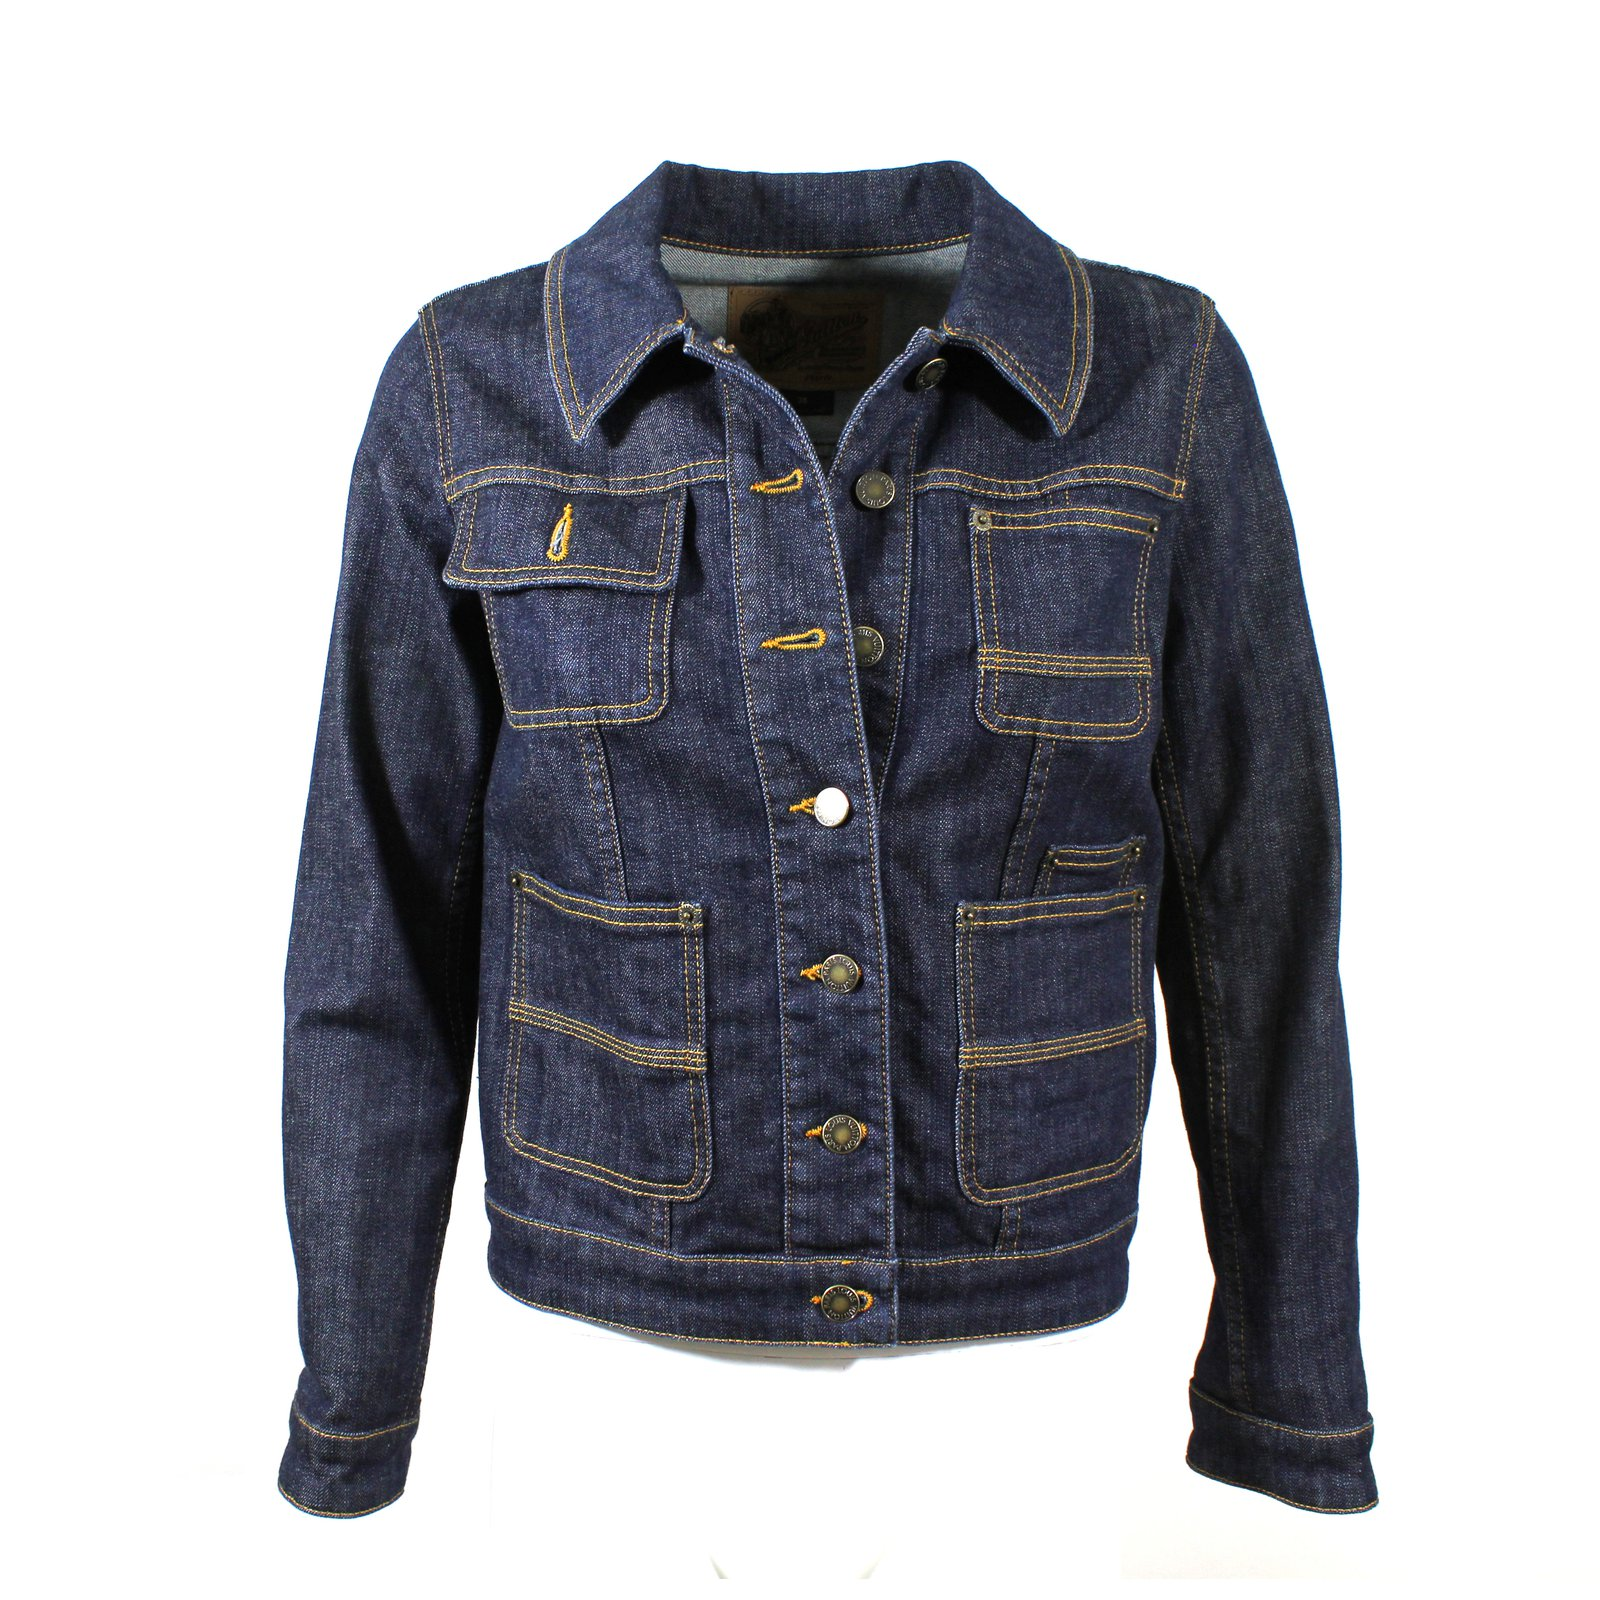 louis vuitton jackets jackets denim blue joli. Black Bedroom Furniture Sets. Home Design Ideas